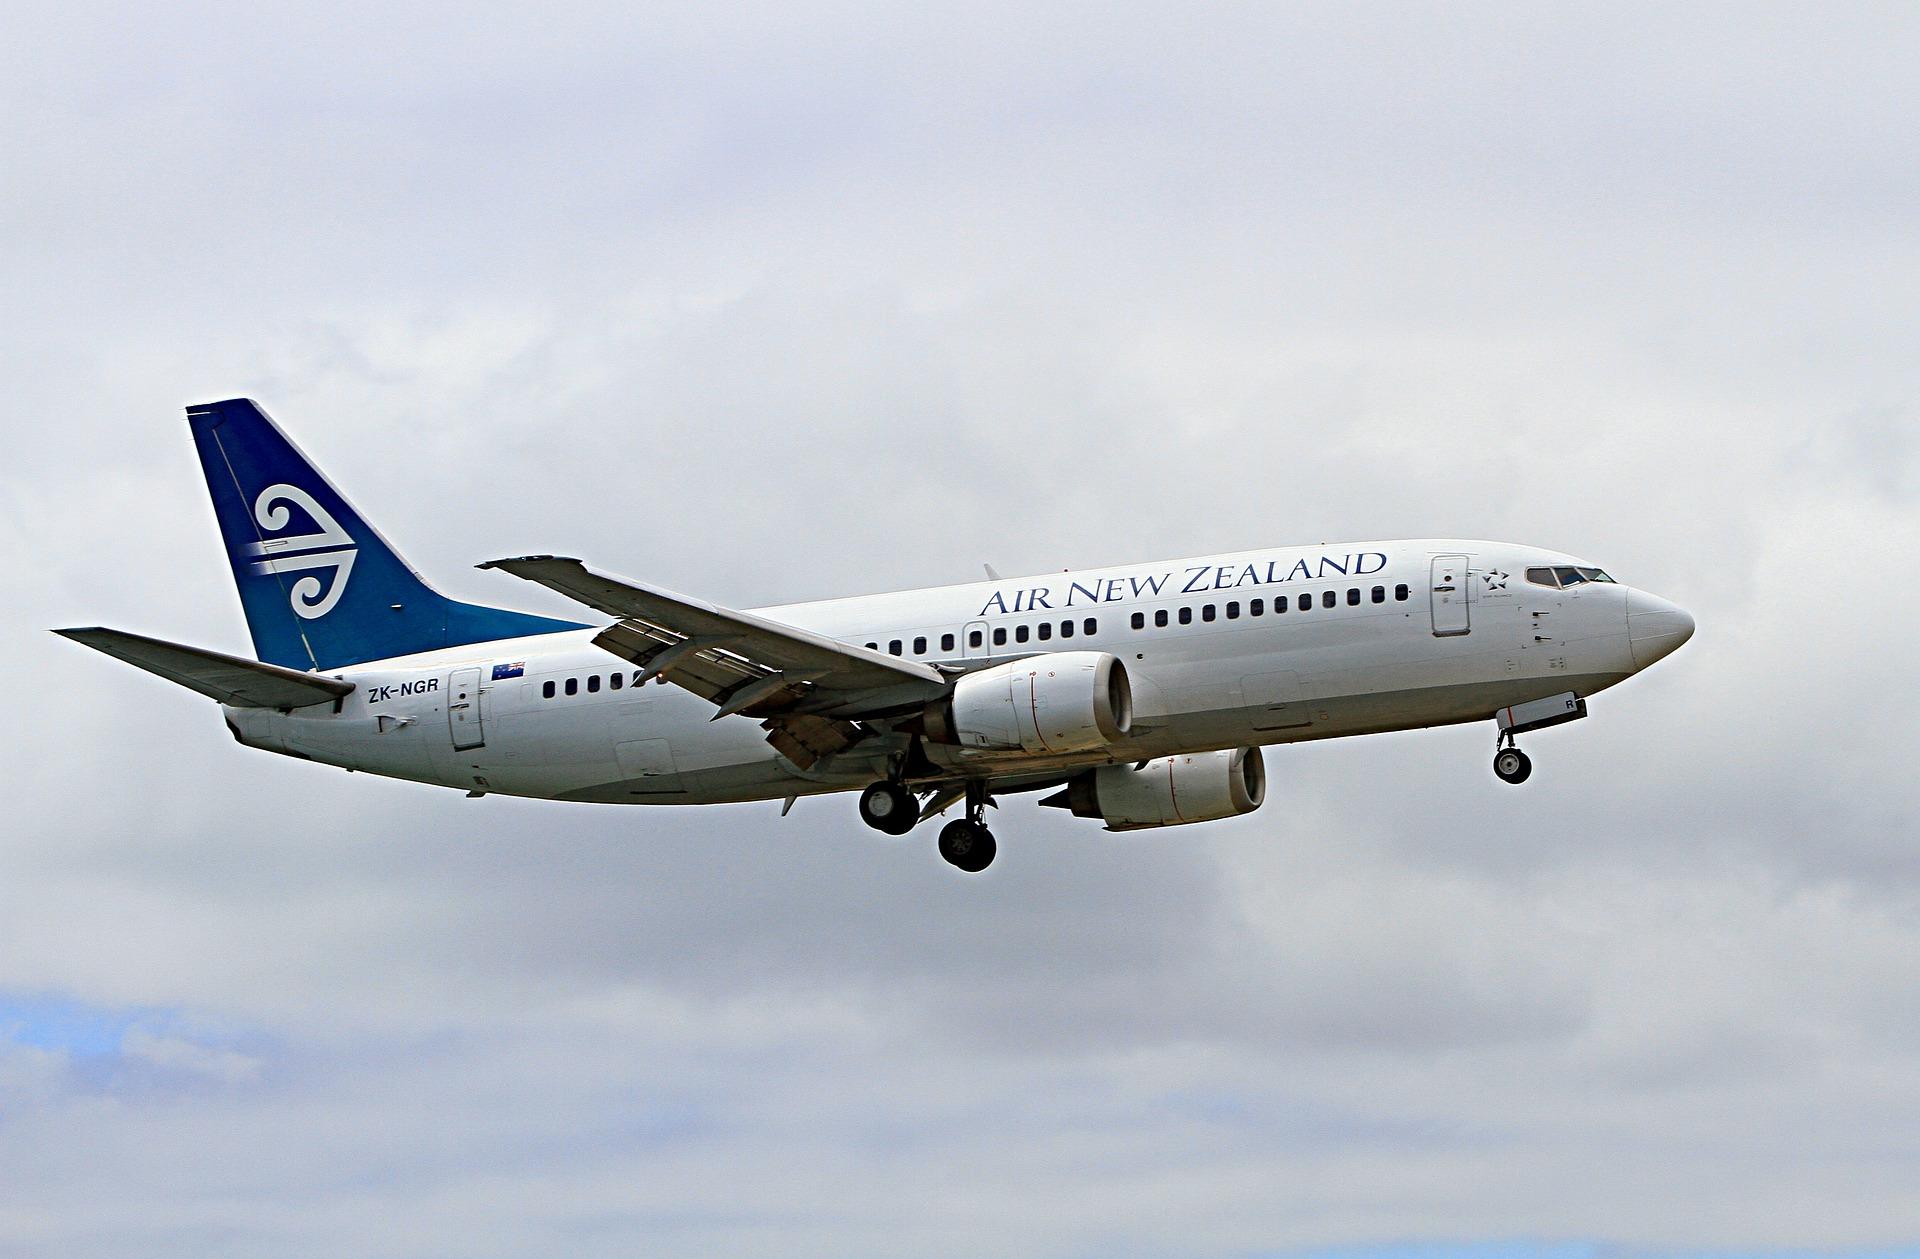 aeroplane-93499_1920.jpg